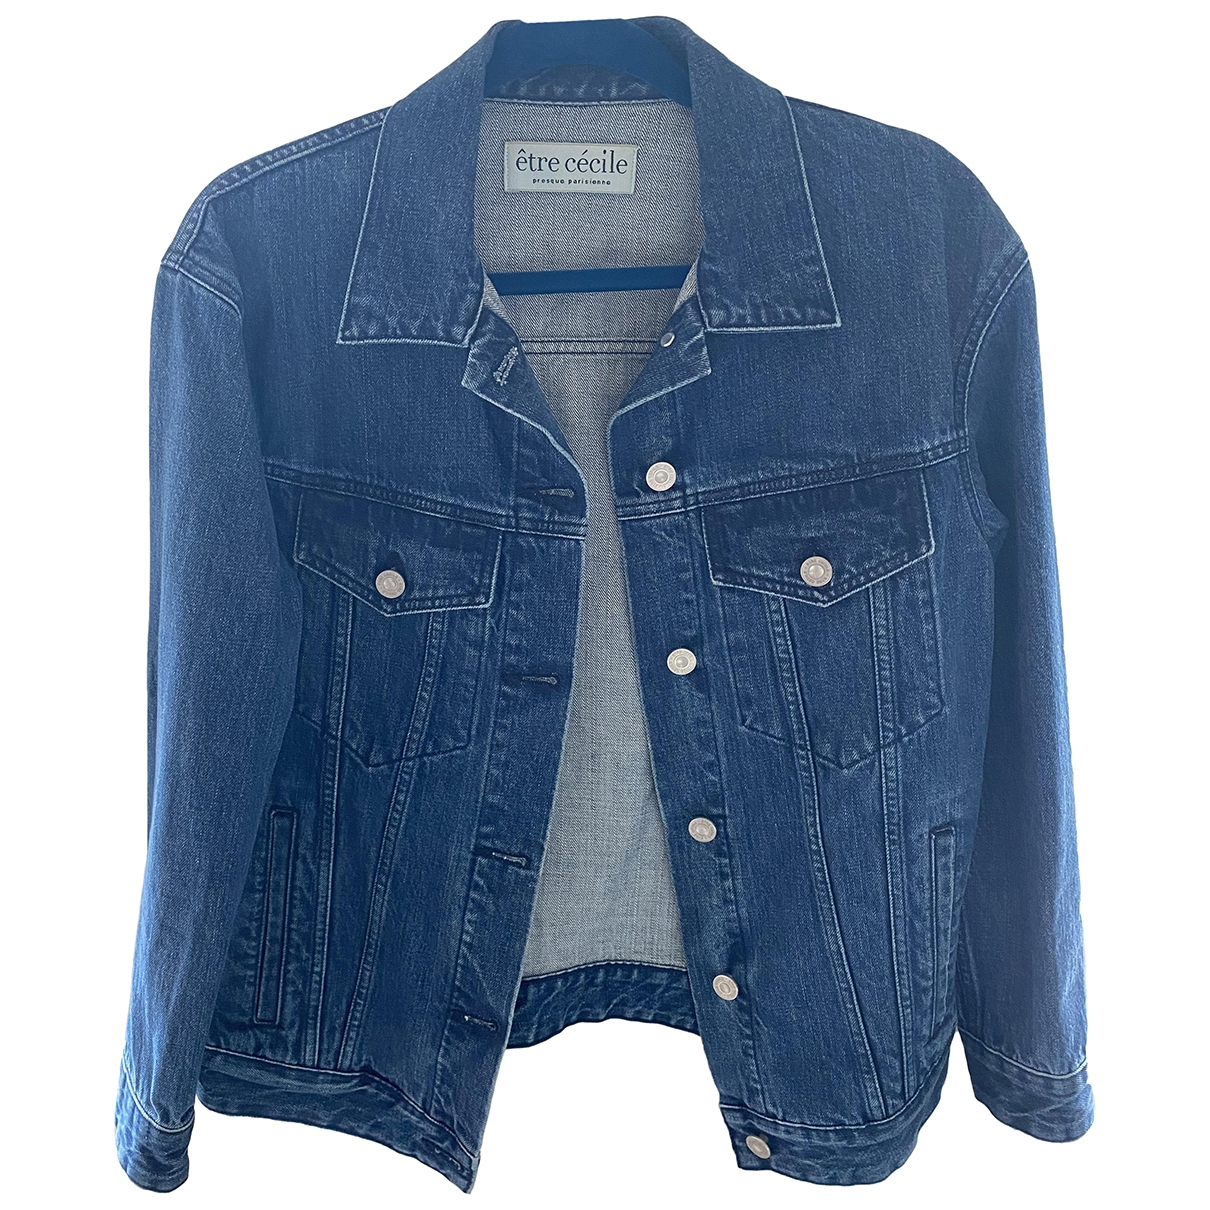 Etre Cecile \N Blue Denim - Jeans jacket for Women S International